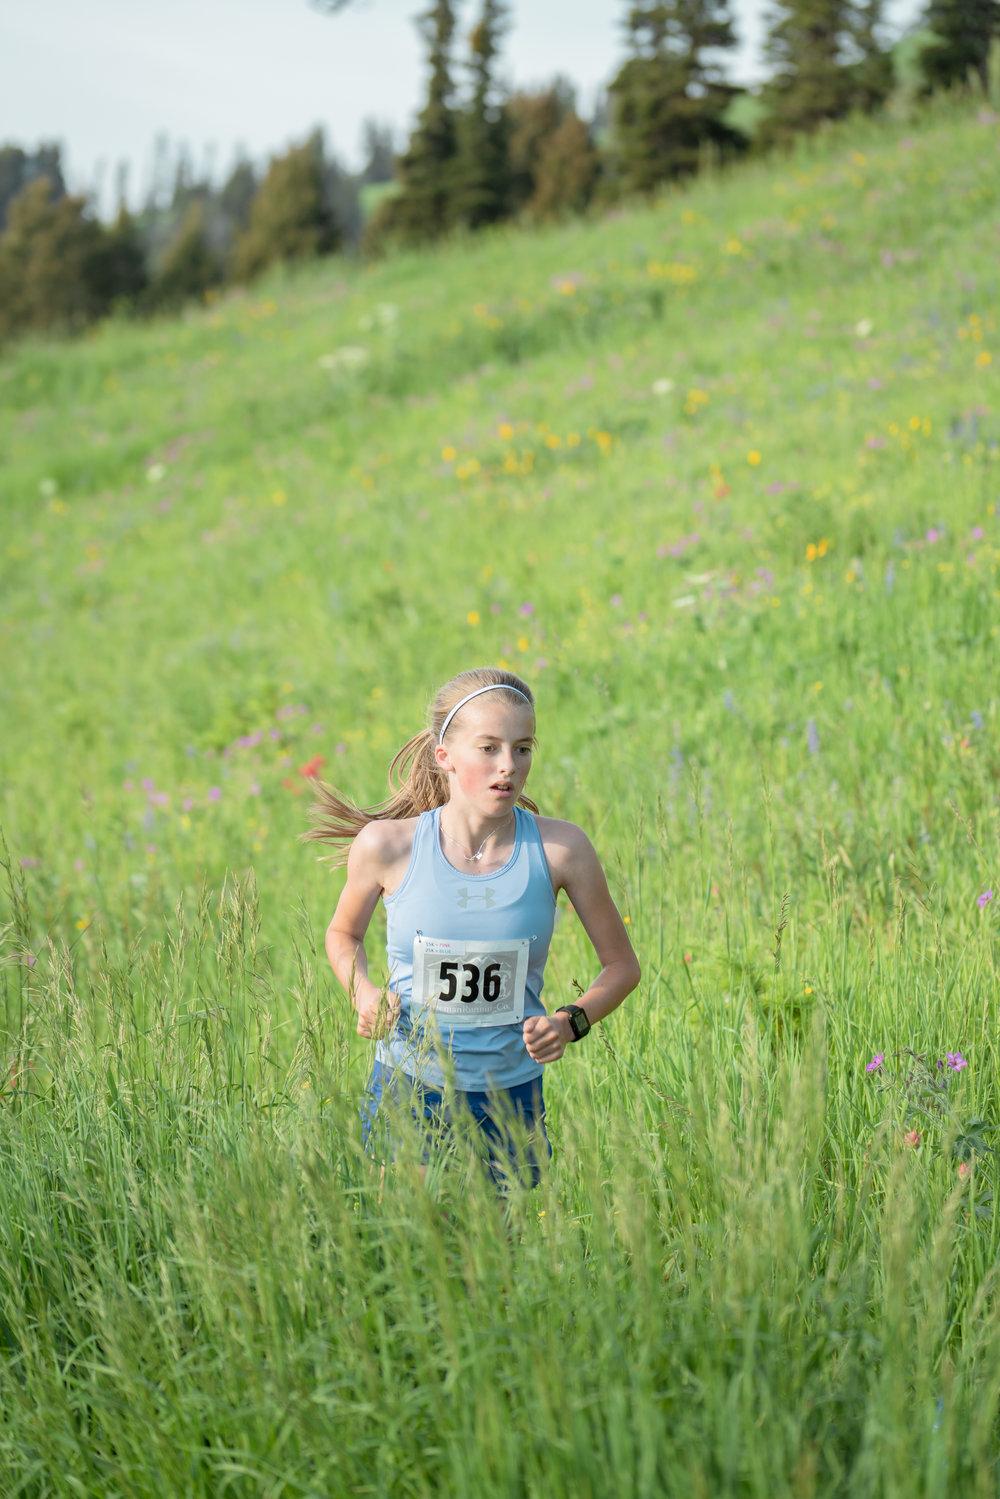 A young runner at Bozeman Running Co. racing of Crosscuts at Bridger Bowl just north of Bozeman, Montana.